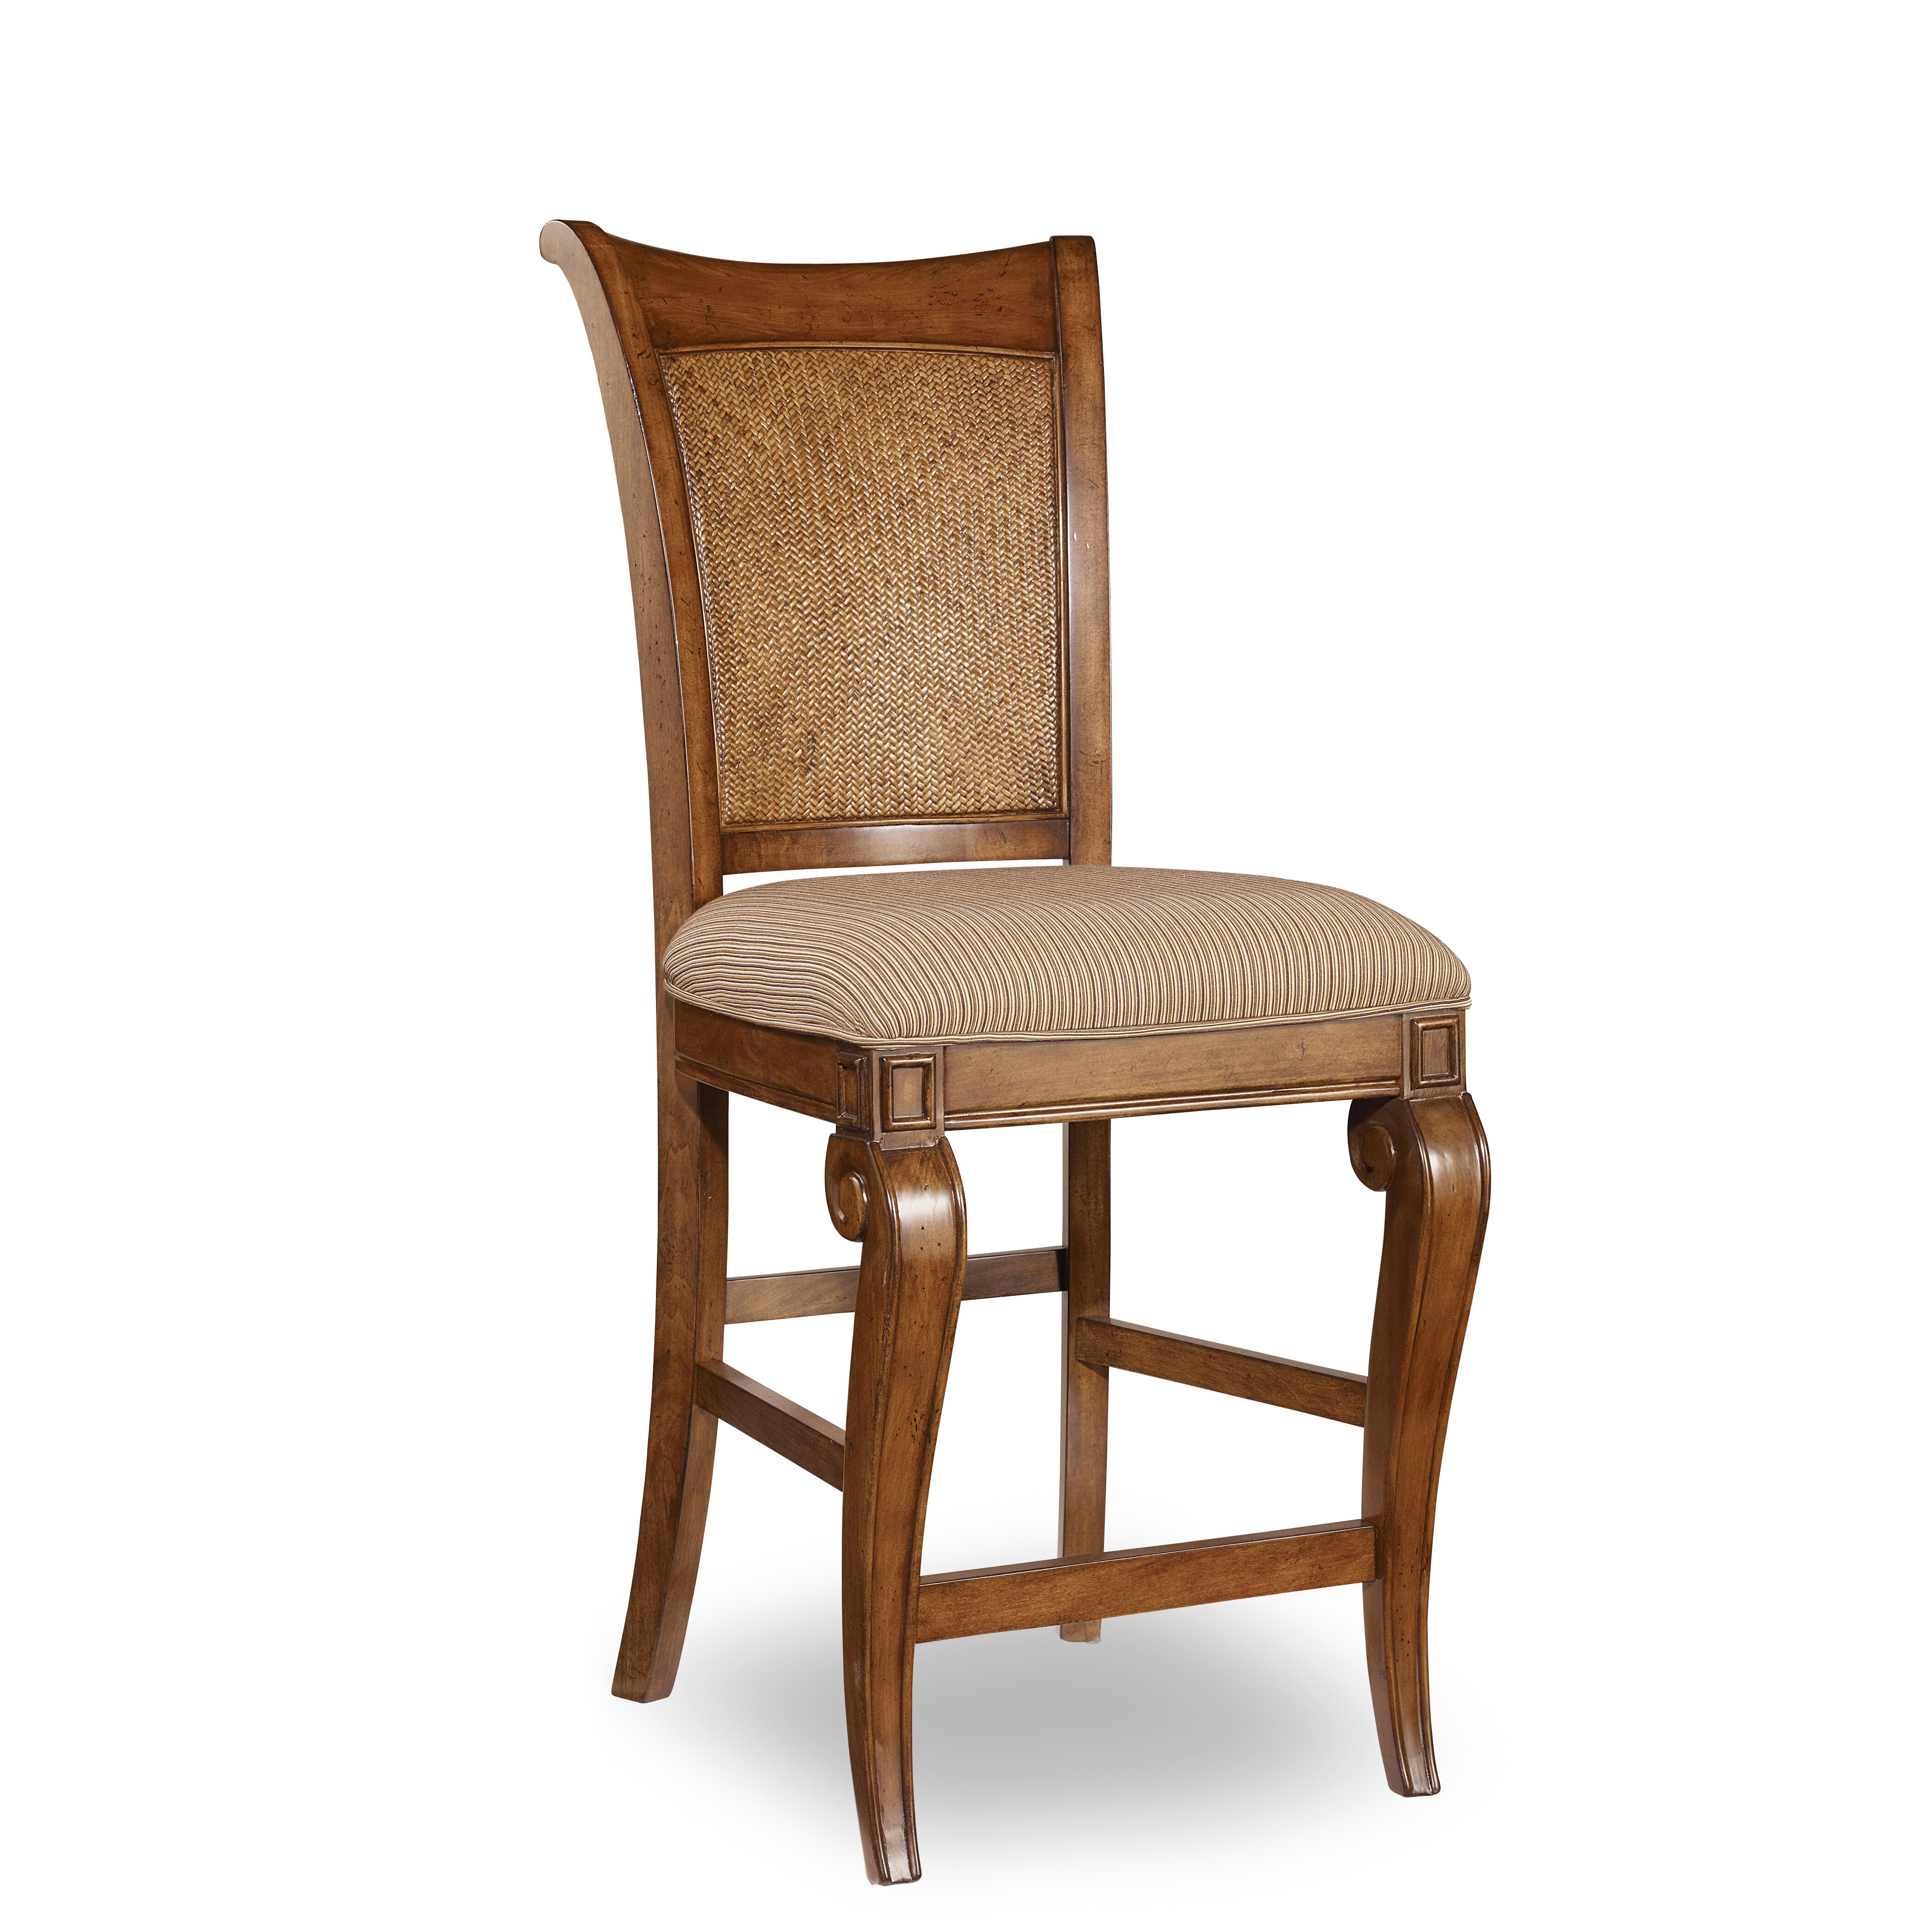 Hooker furniture windward 24 bar stool reviews for Furniture 24